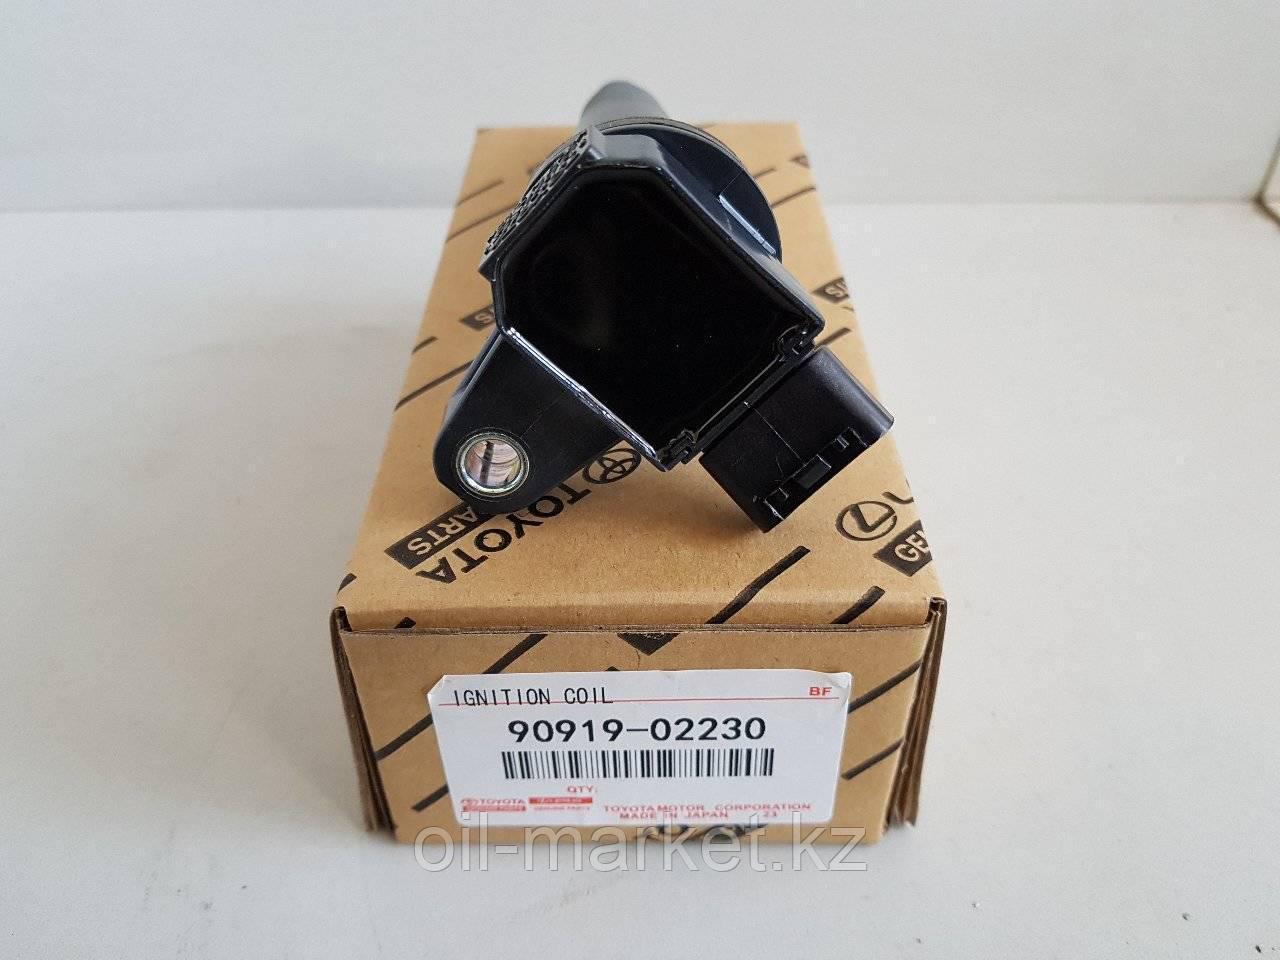 Катушка зажигания Toyota 1GFE,2UZFE -03 90919-02230